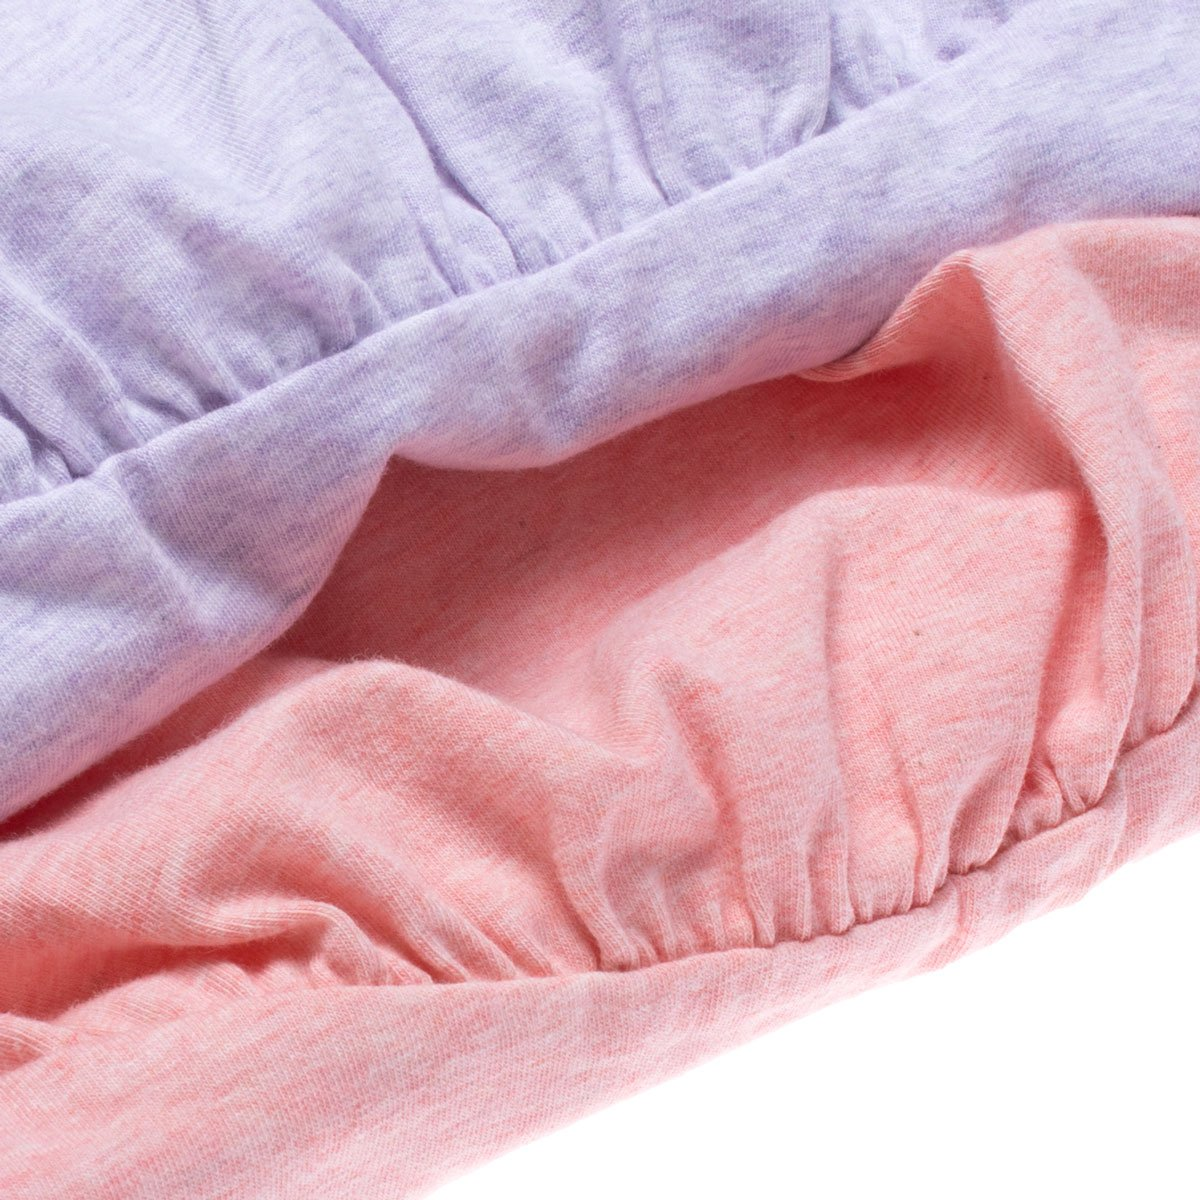 Intimate Portal Women Anti Chafing Maternity Pregnancy Boyshort Brief 2-Pk